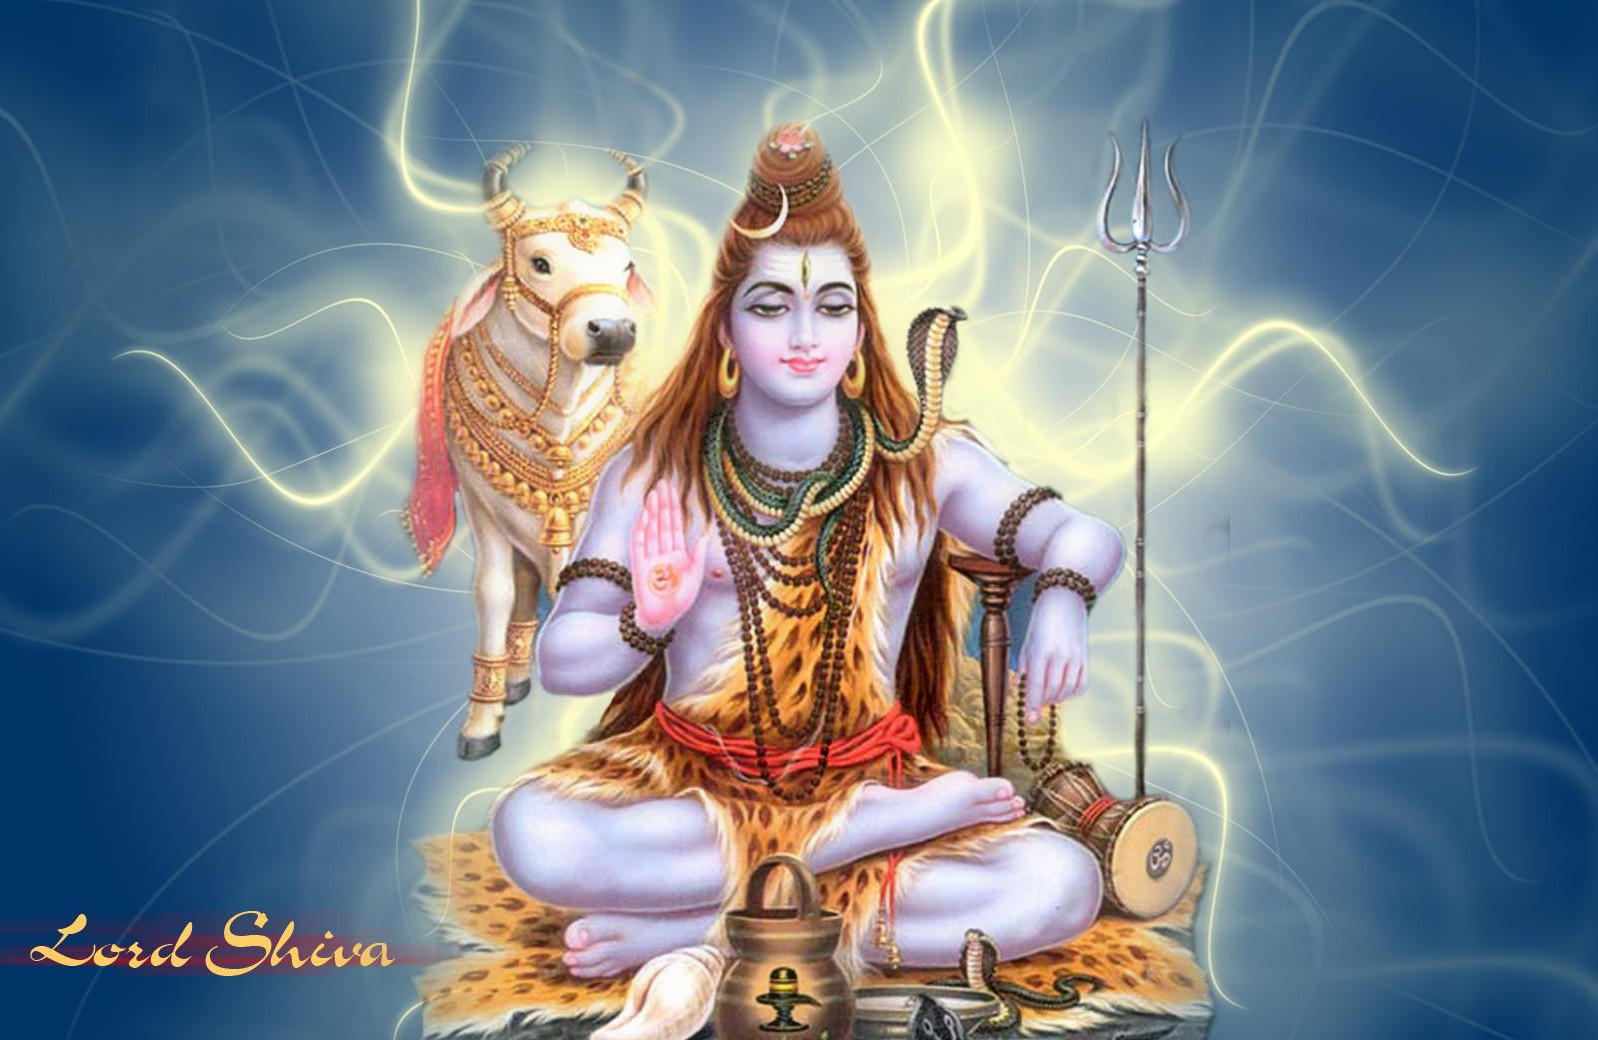 Most Inspiring Wallpaper High Quality Shiva - Lord-Shiva-Ji  Image_344022.jpg